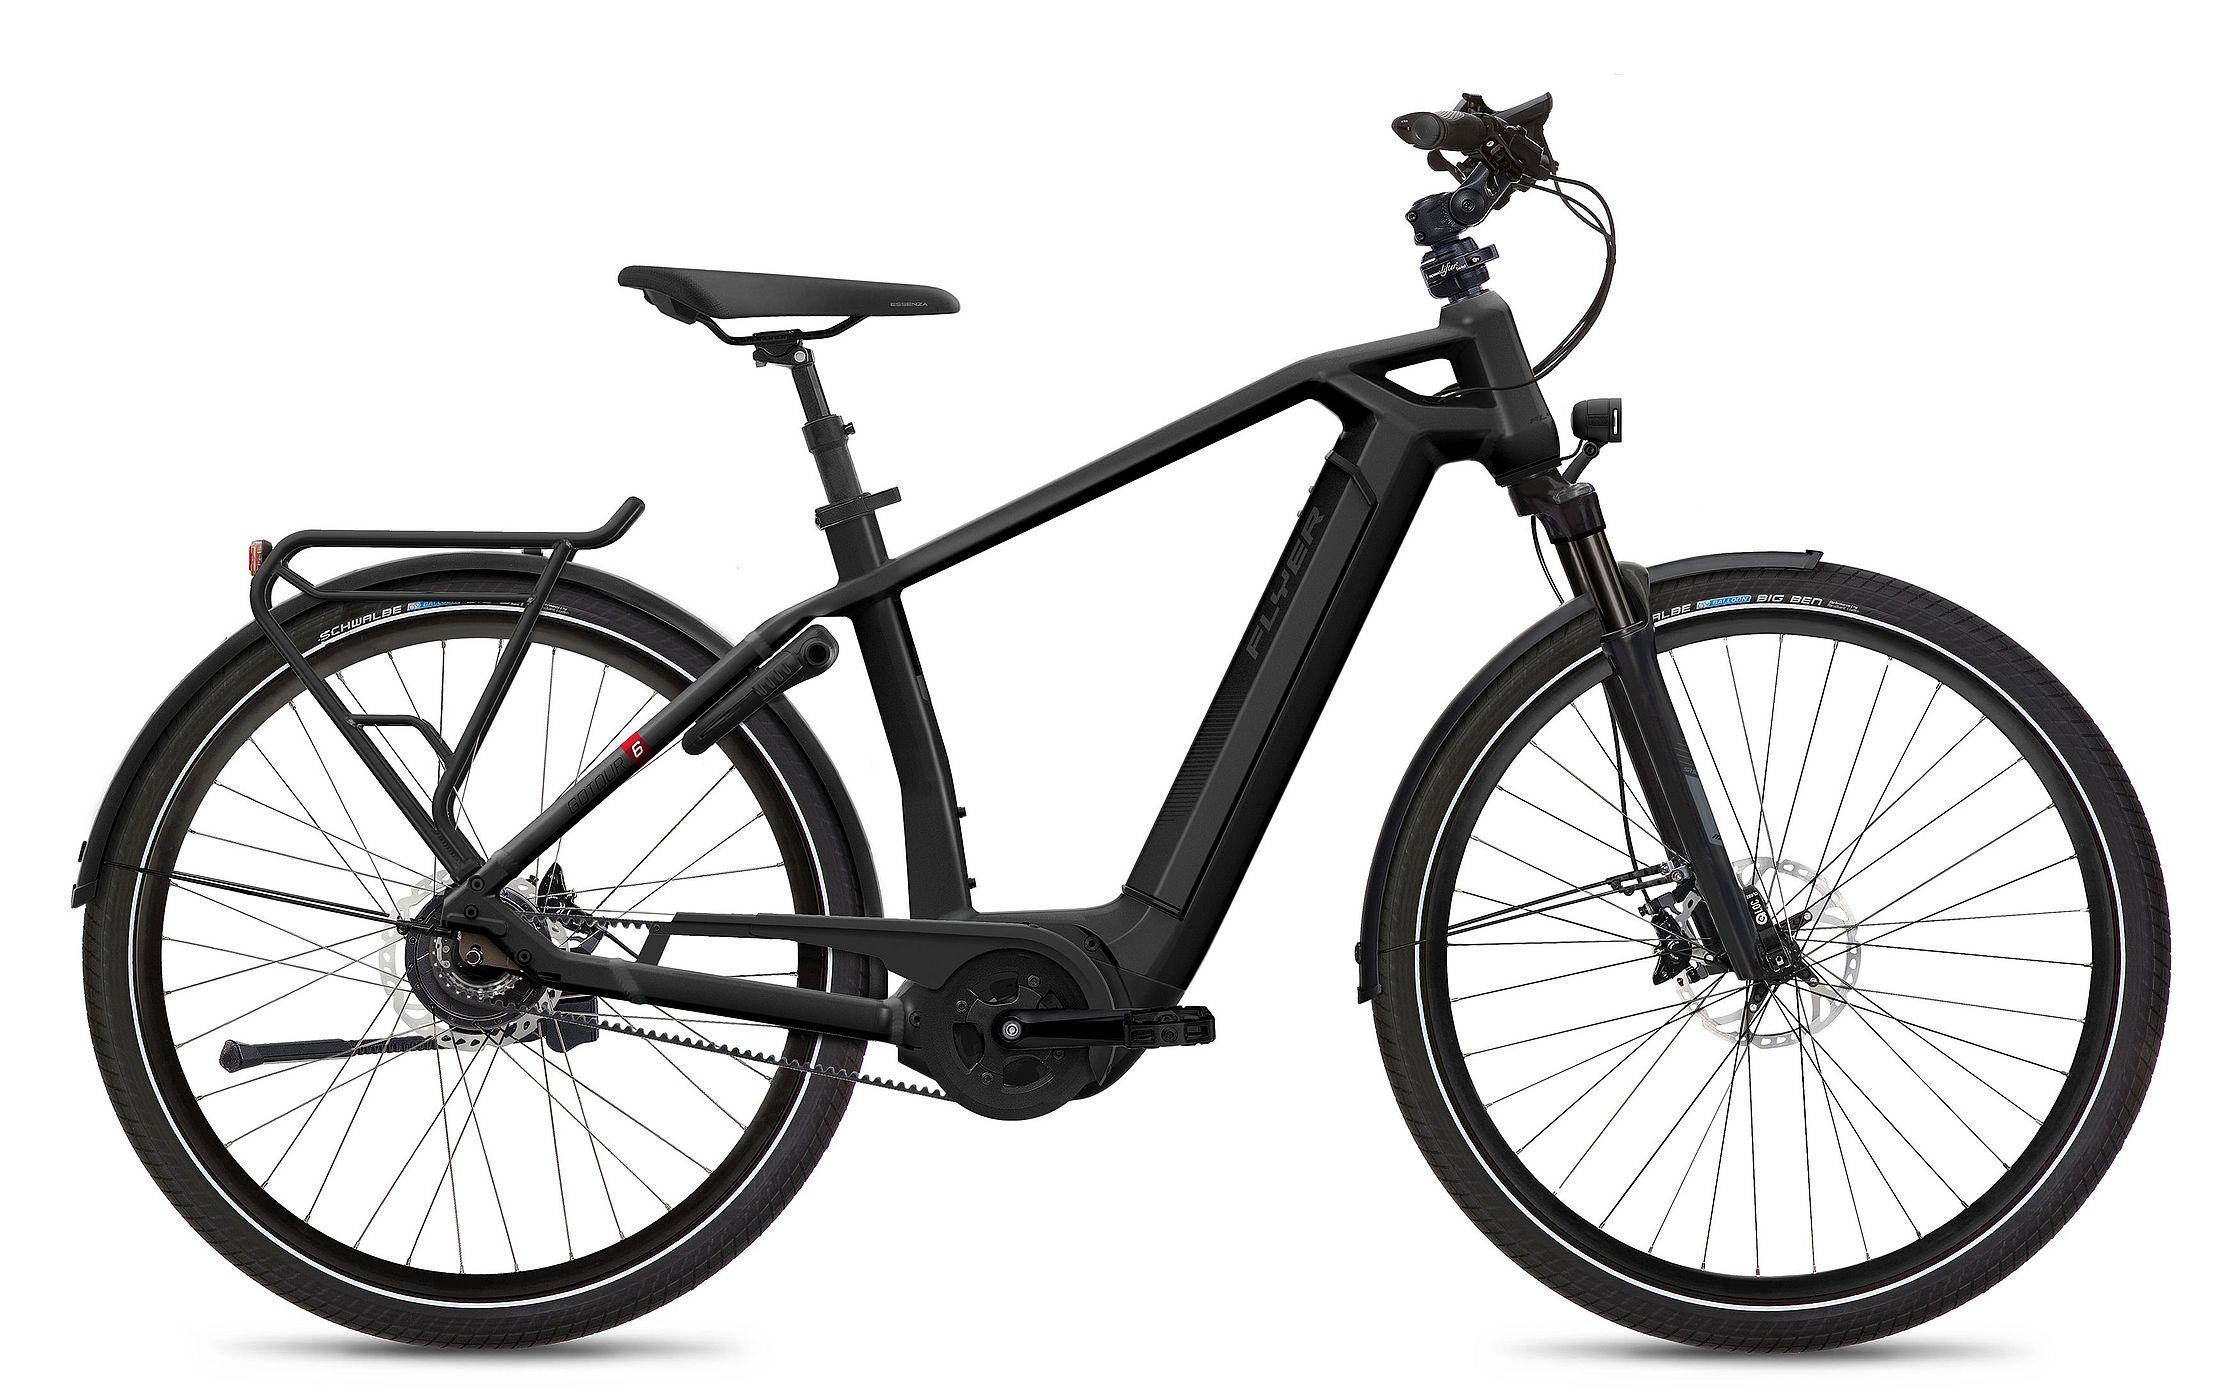 FLYER_E-Bikes_MY21_Gotour6_703_Gents_BlackMatt